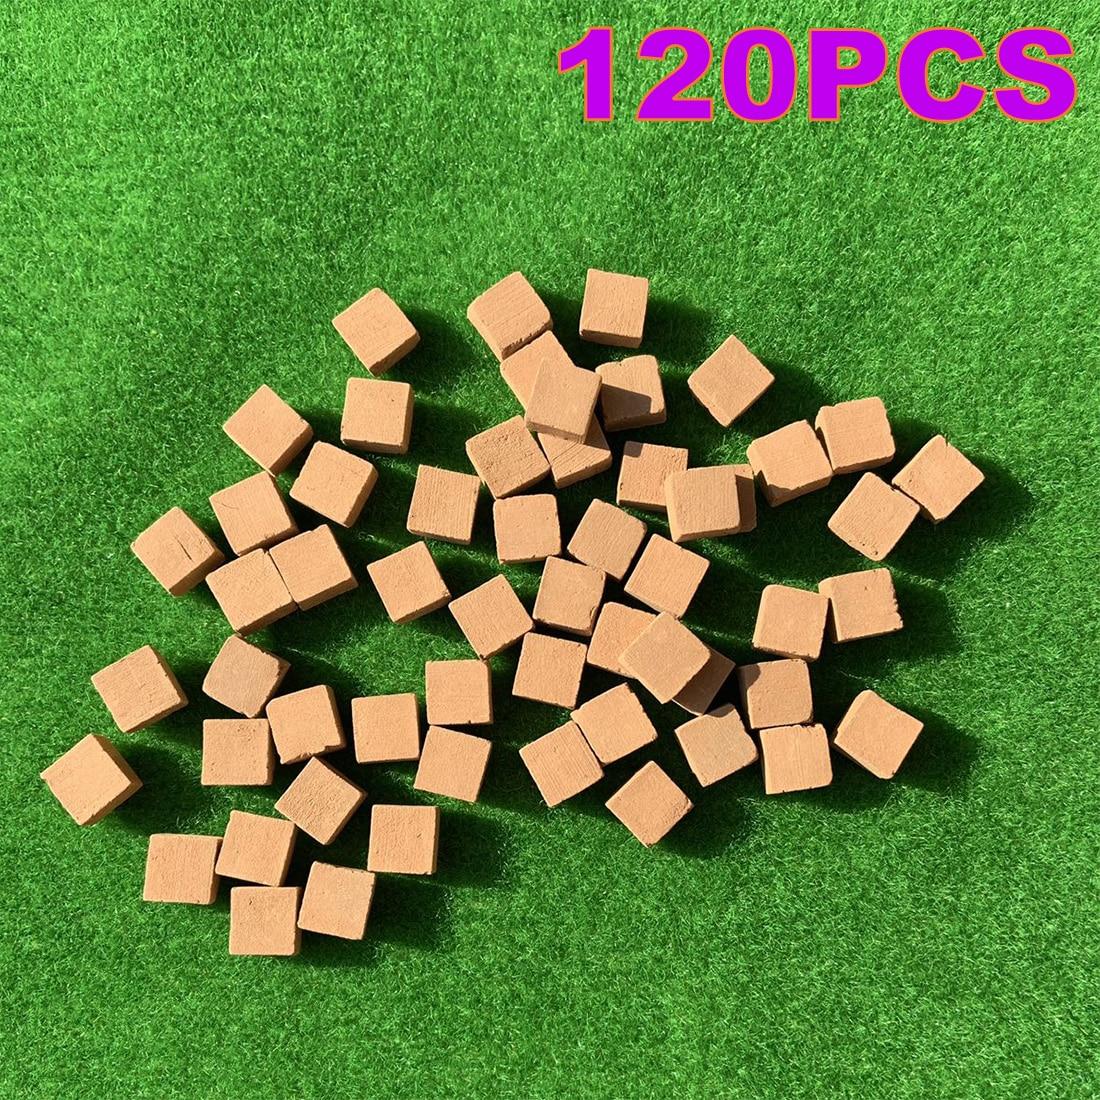 70/120Pcs 1:16 Scale Mini Red Half Bricks Model Antique Micro Landscape Decorative Bricks For DIY Sand Table Building   Red